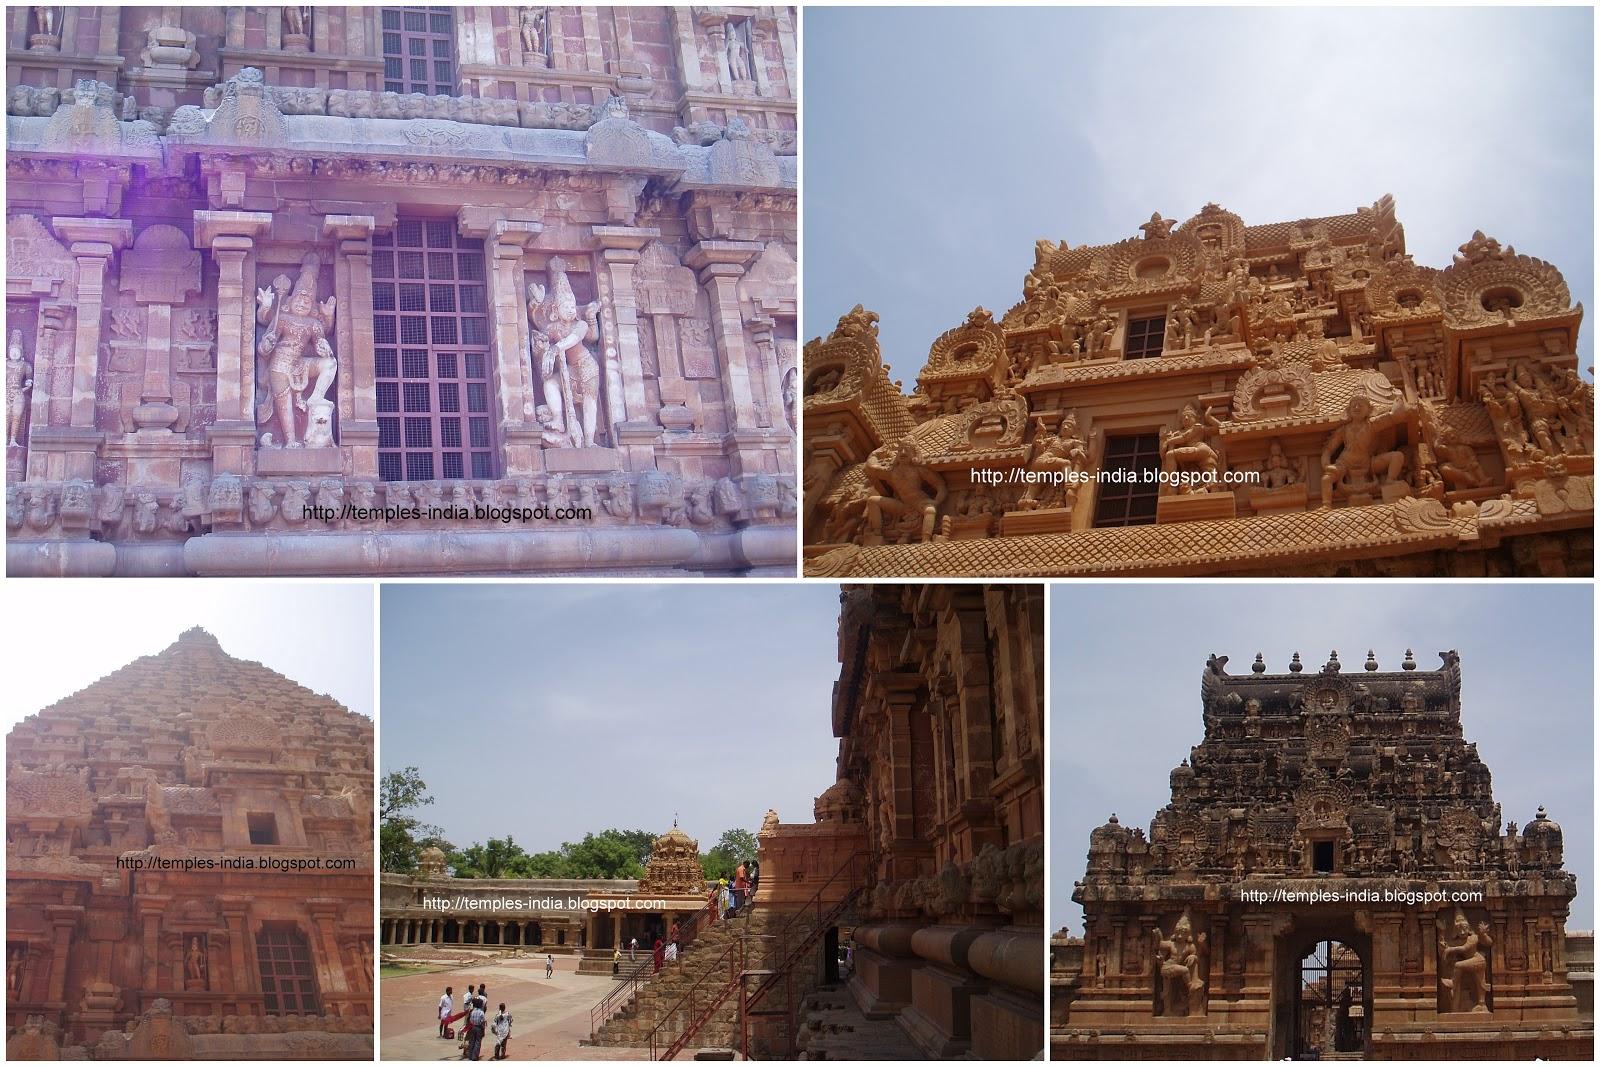 thanjavur senior personals Hindu temples of kumbakonam  the chieftain of achutha nayakar of thanjavur,  the area surrounding kumbakonam is home to a set of navagraha temples dating from.